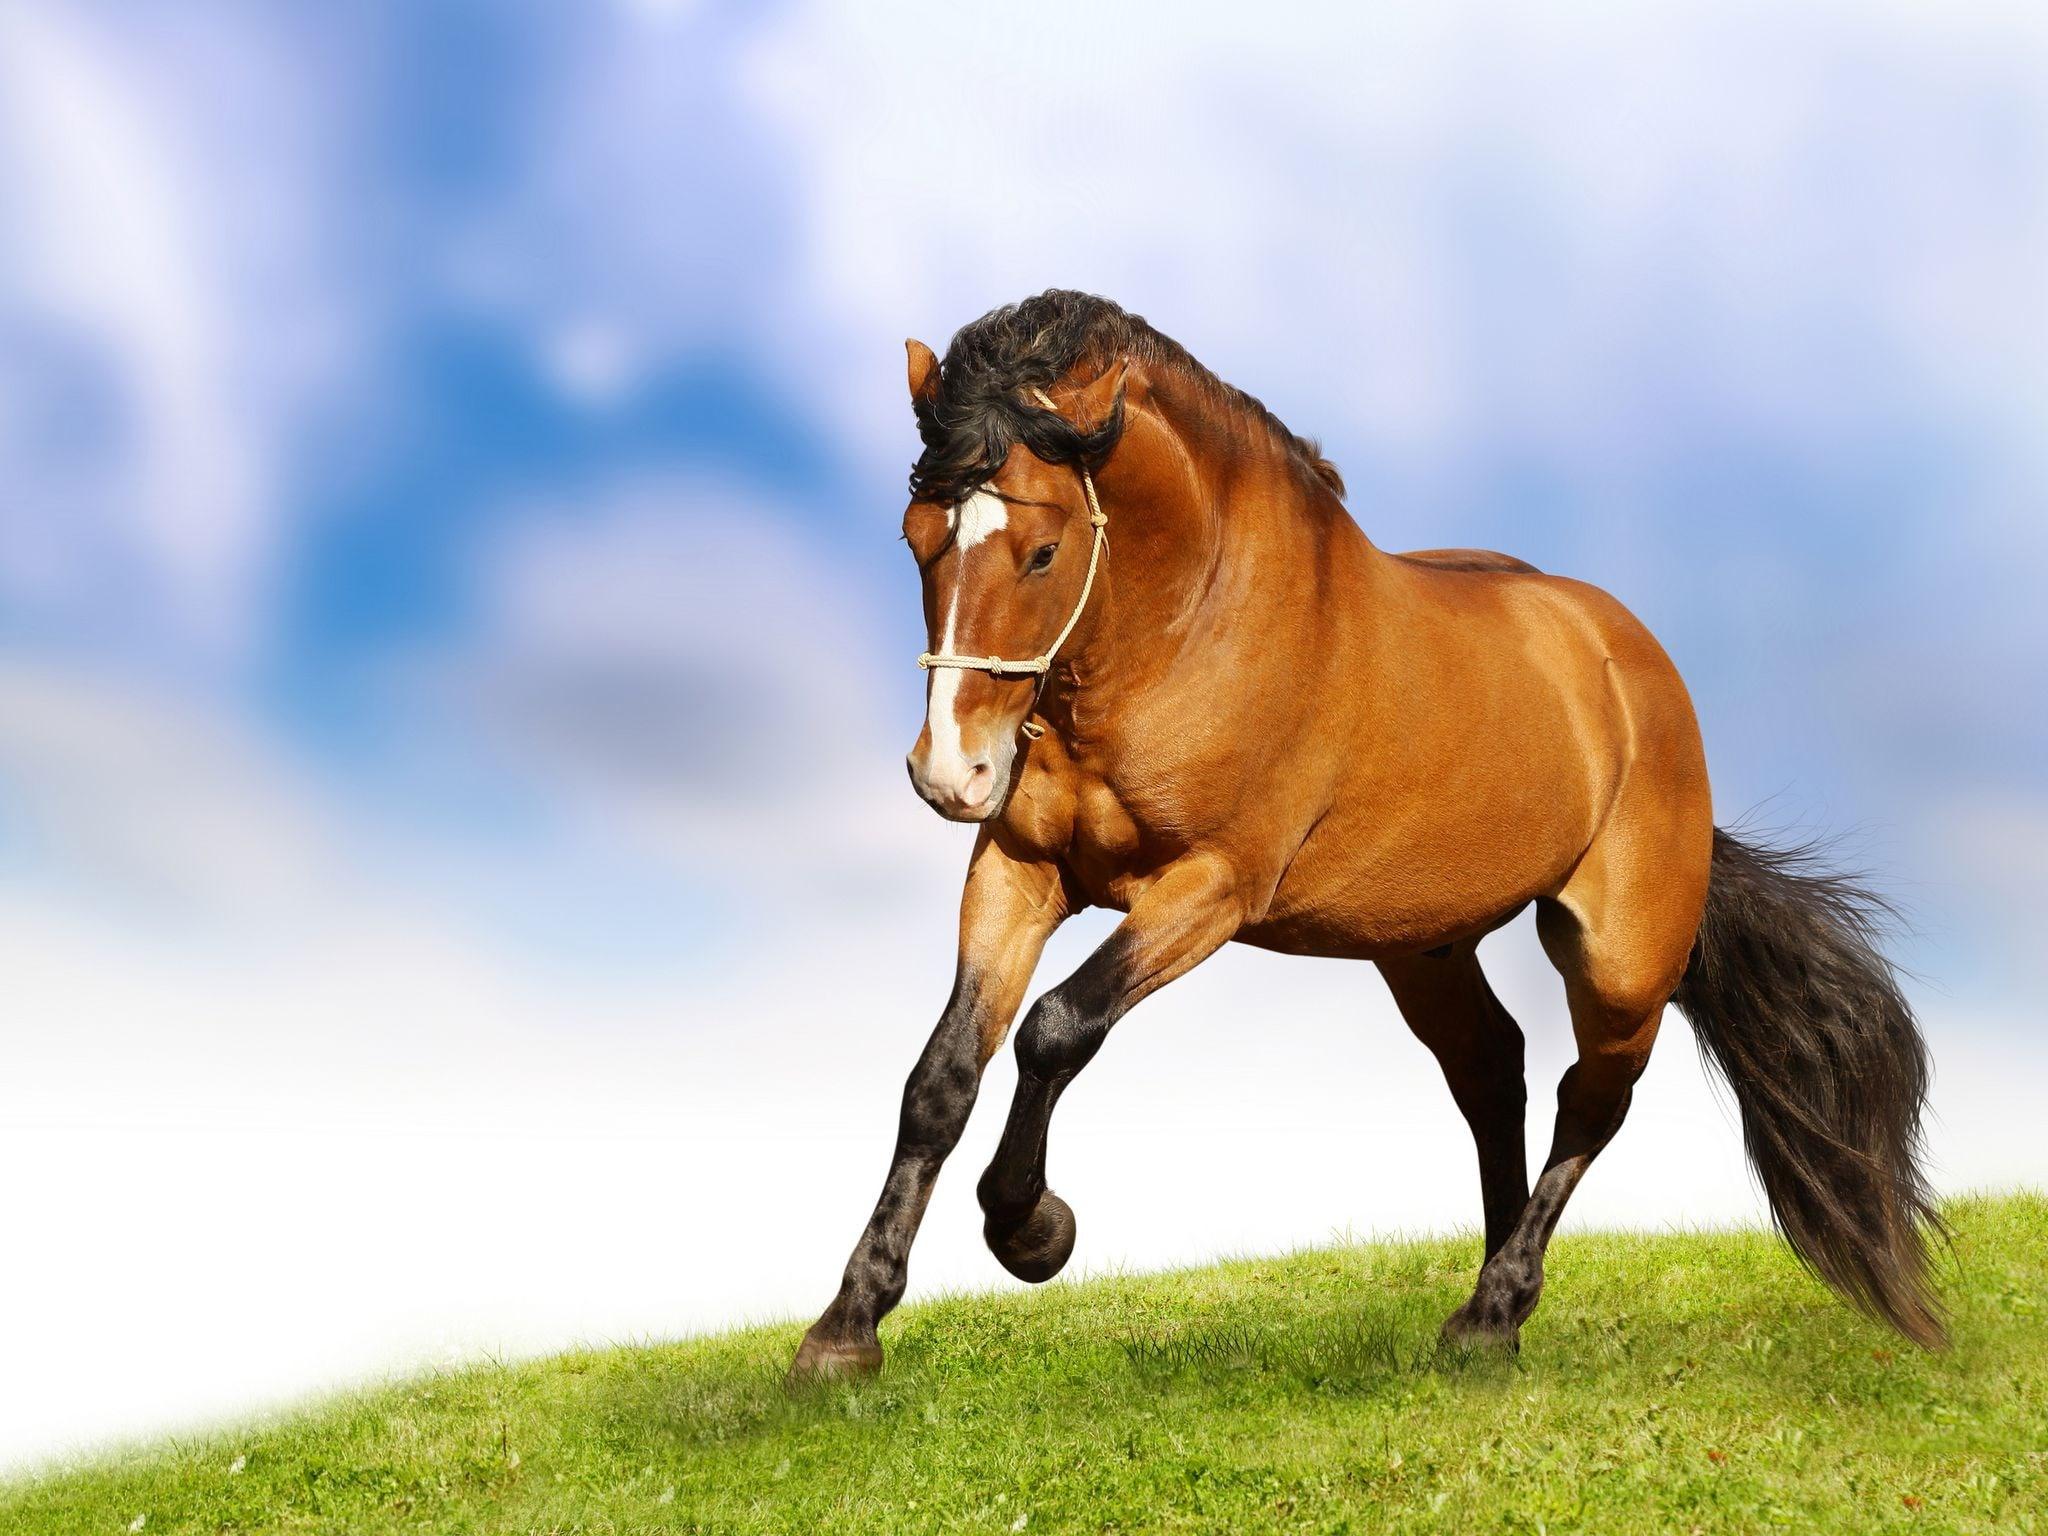 Horse desktop backgrounds 1080P 2K 4K 5K HD wallpapers 2048x1536